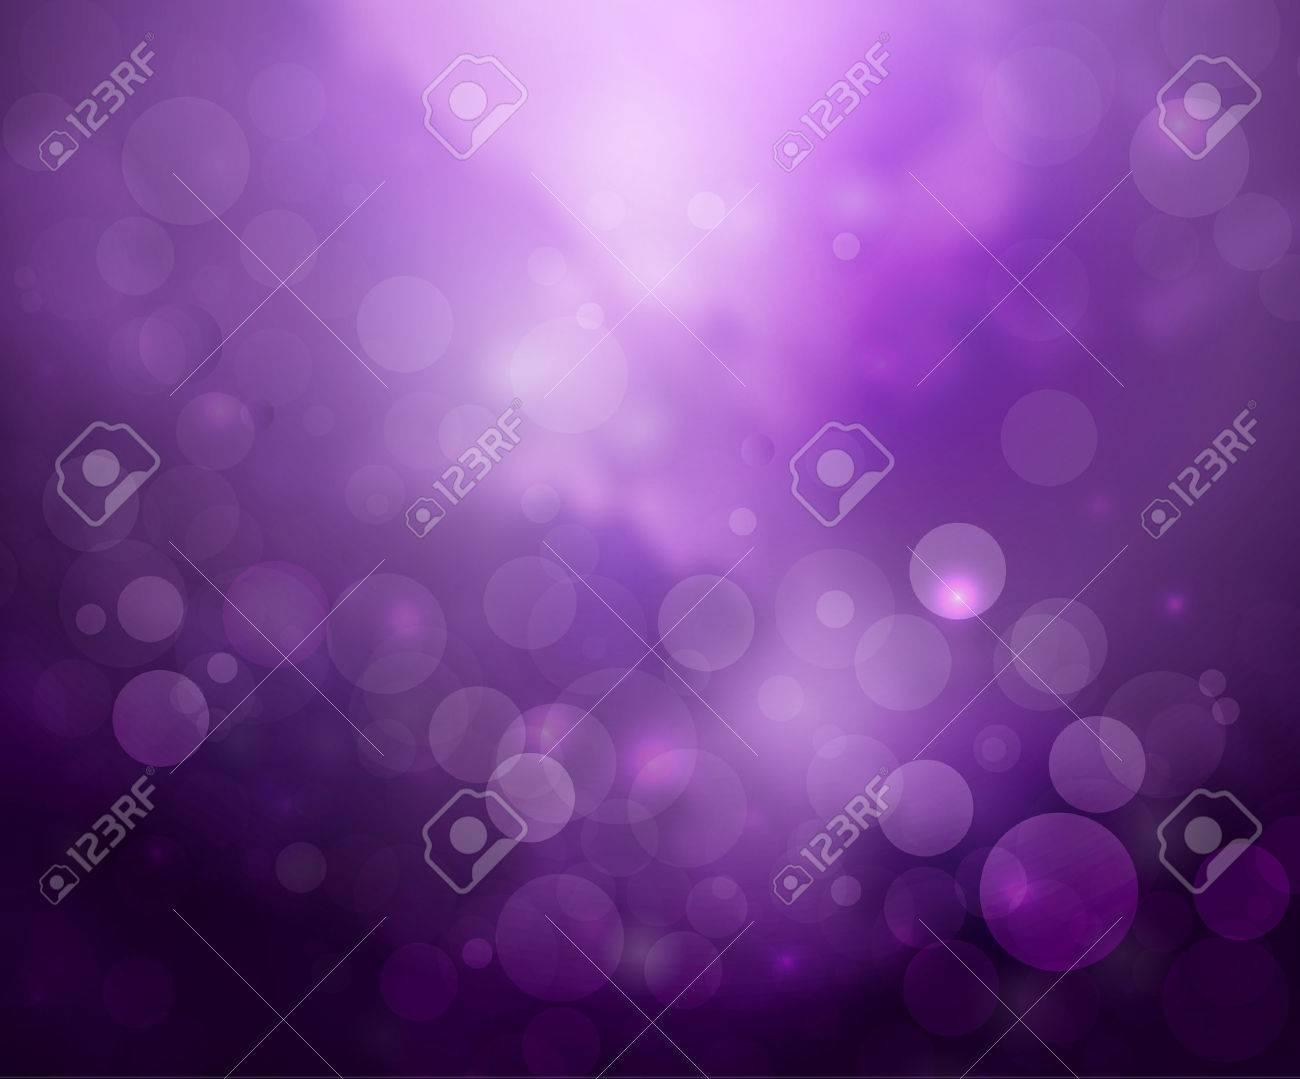 Purple lights background fantasy bokeh on white - 53771941